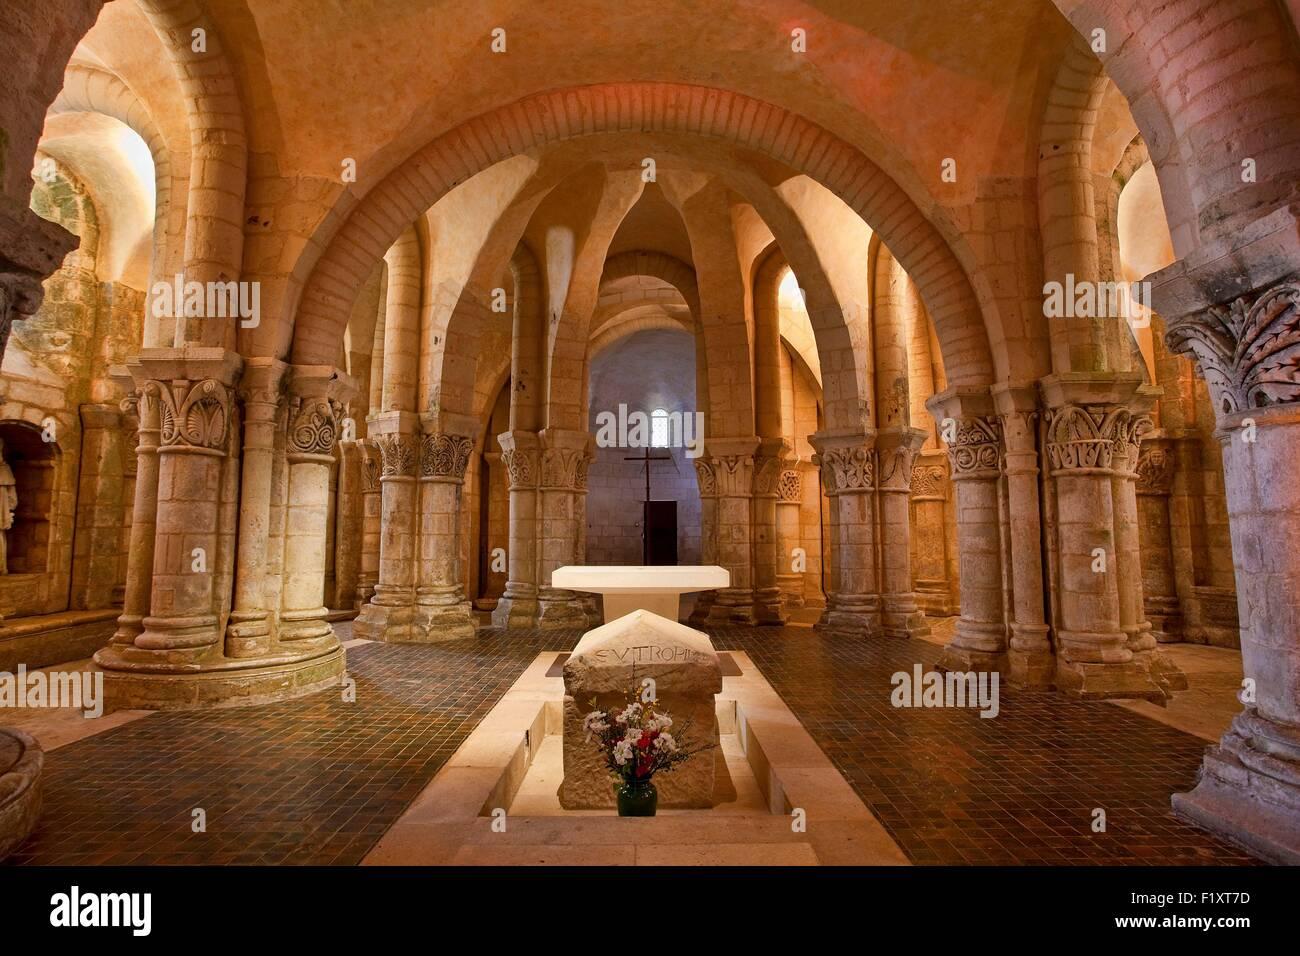 France, Charente Maritime, Saintes, Saint Eutrope basilica, the Crypt - Stock Image